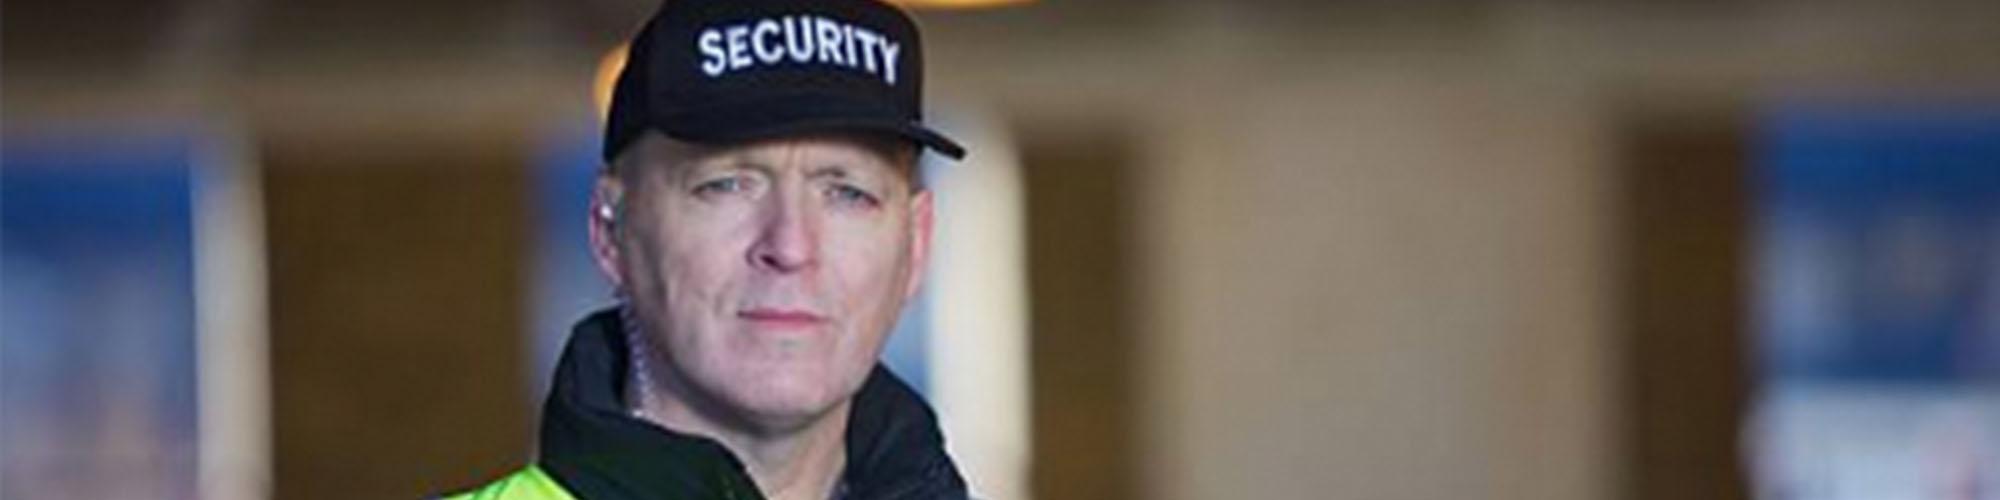 Security, Company, Birmingham, Security Guard,